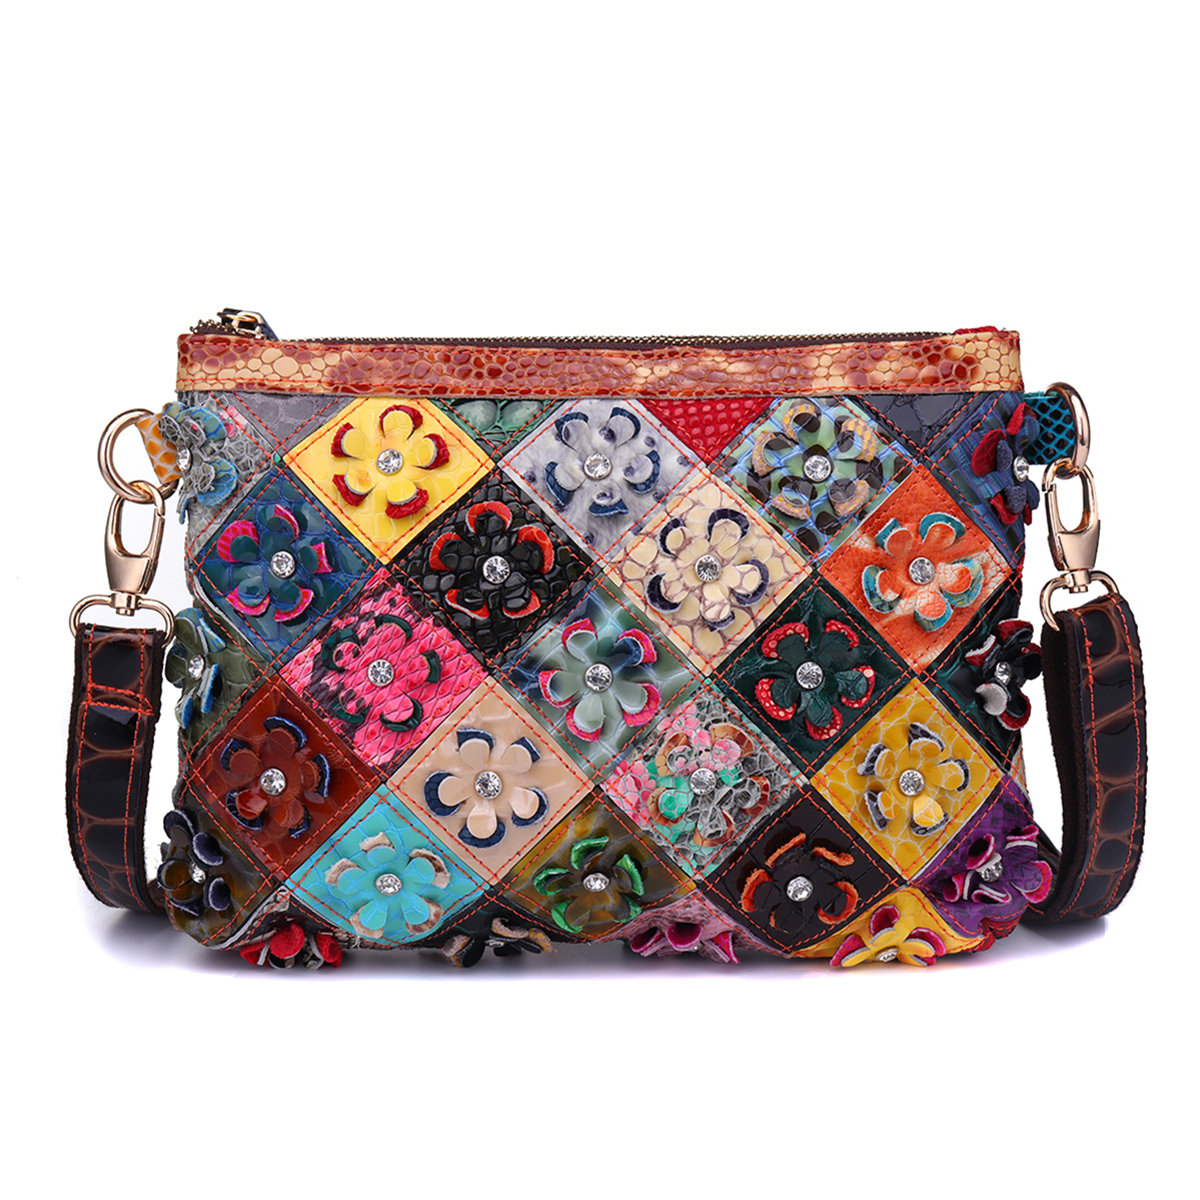 Women Flower Decorational Genuine Leather Patchwork Shoulder Bags Crosbsody Bags